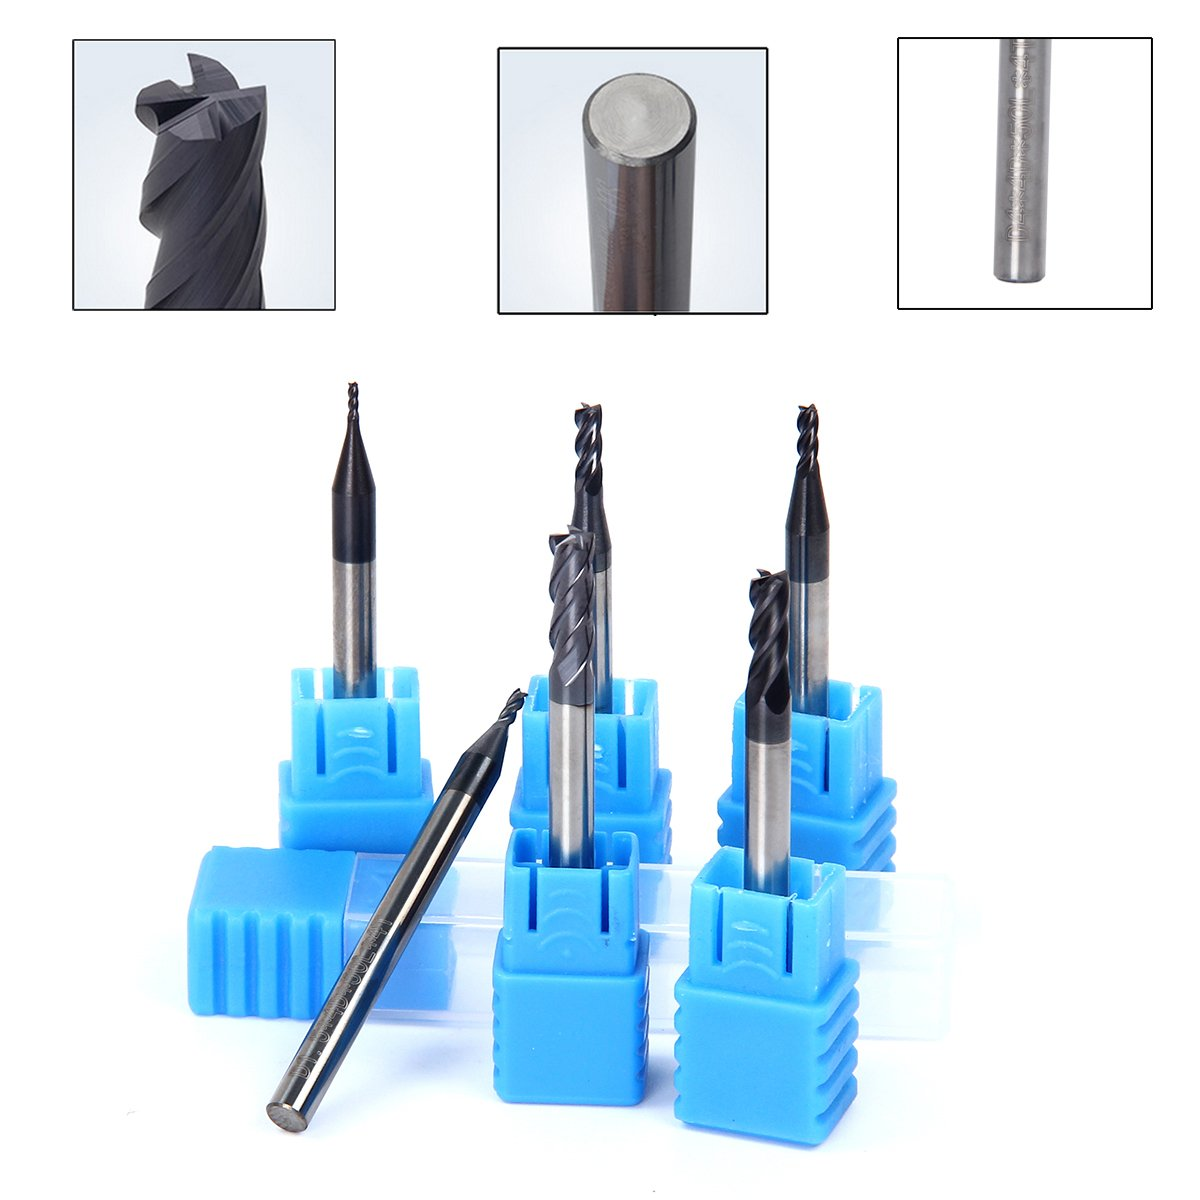 TargetEvo 6pcs 1mm 1.5mm 2mm 2.5mm 3.5mm 4mm CNC Lathe Milling Cutters End Mill Cutters Drill Bits Set 4 Flutes Tungsten Carbide Endmills for Wood Aluminum Steel Titanium